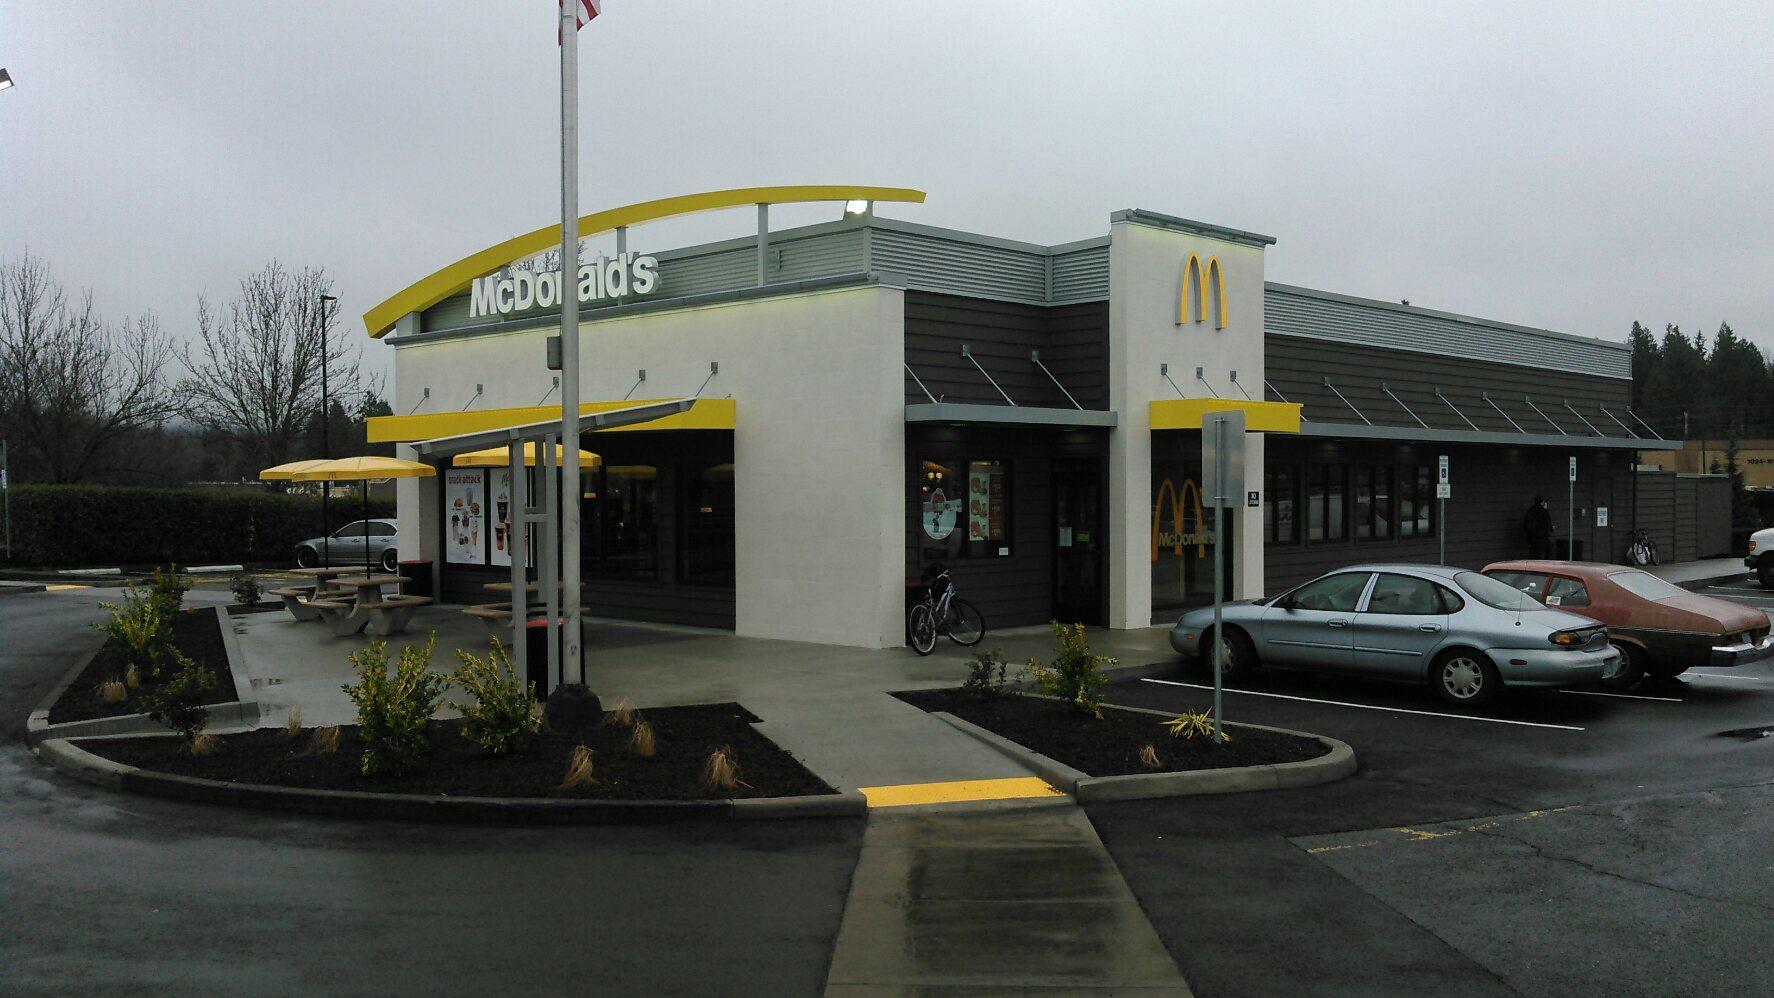 Rich Duncan ConstructionMcDonald's Remodels, Pacific Northwest, fast-food, restaurant